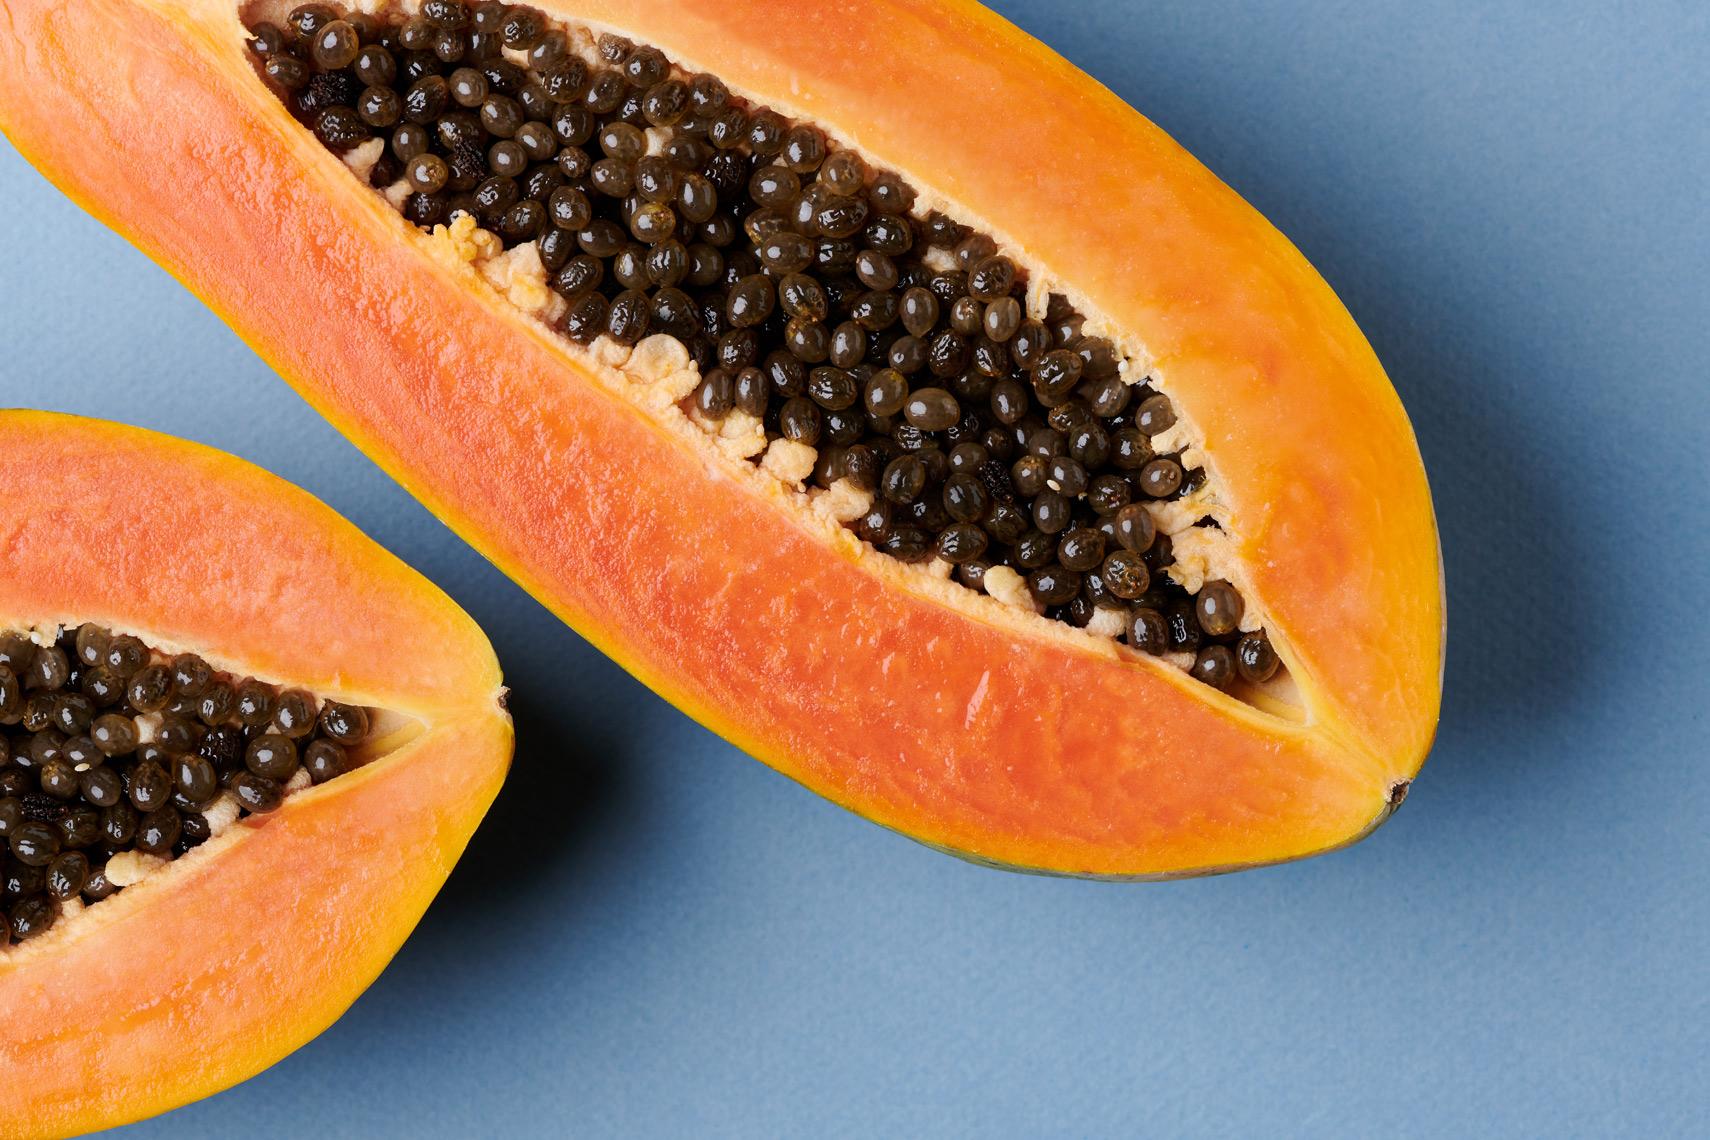 2018 - Vancouver - lifestyle - Photographer - Erich Saide - Advertising - Skoah. - ingredients - product - papaya